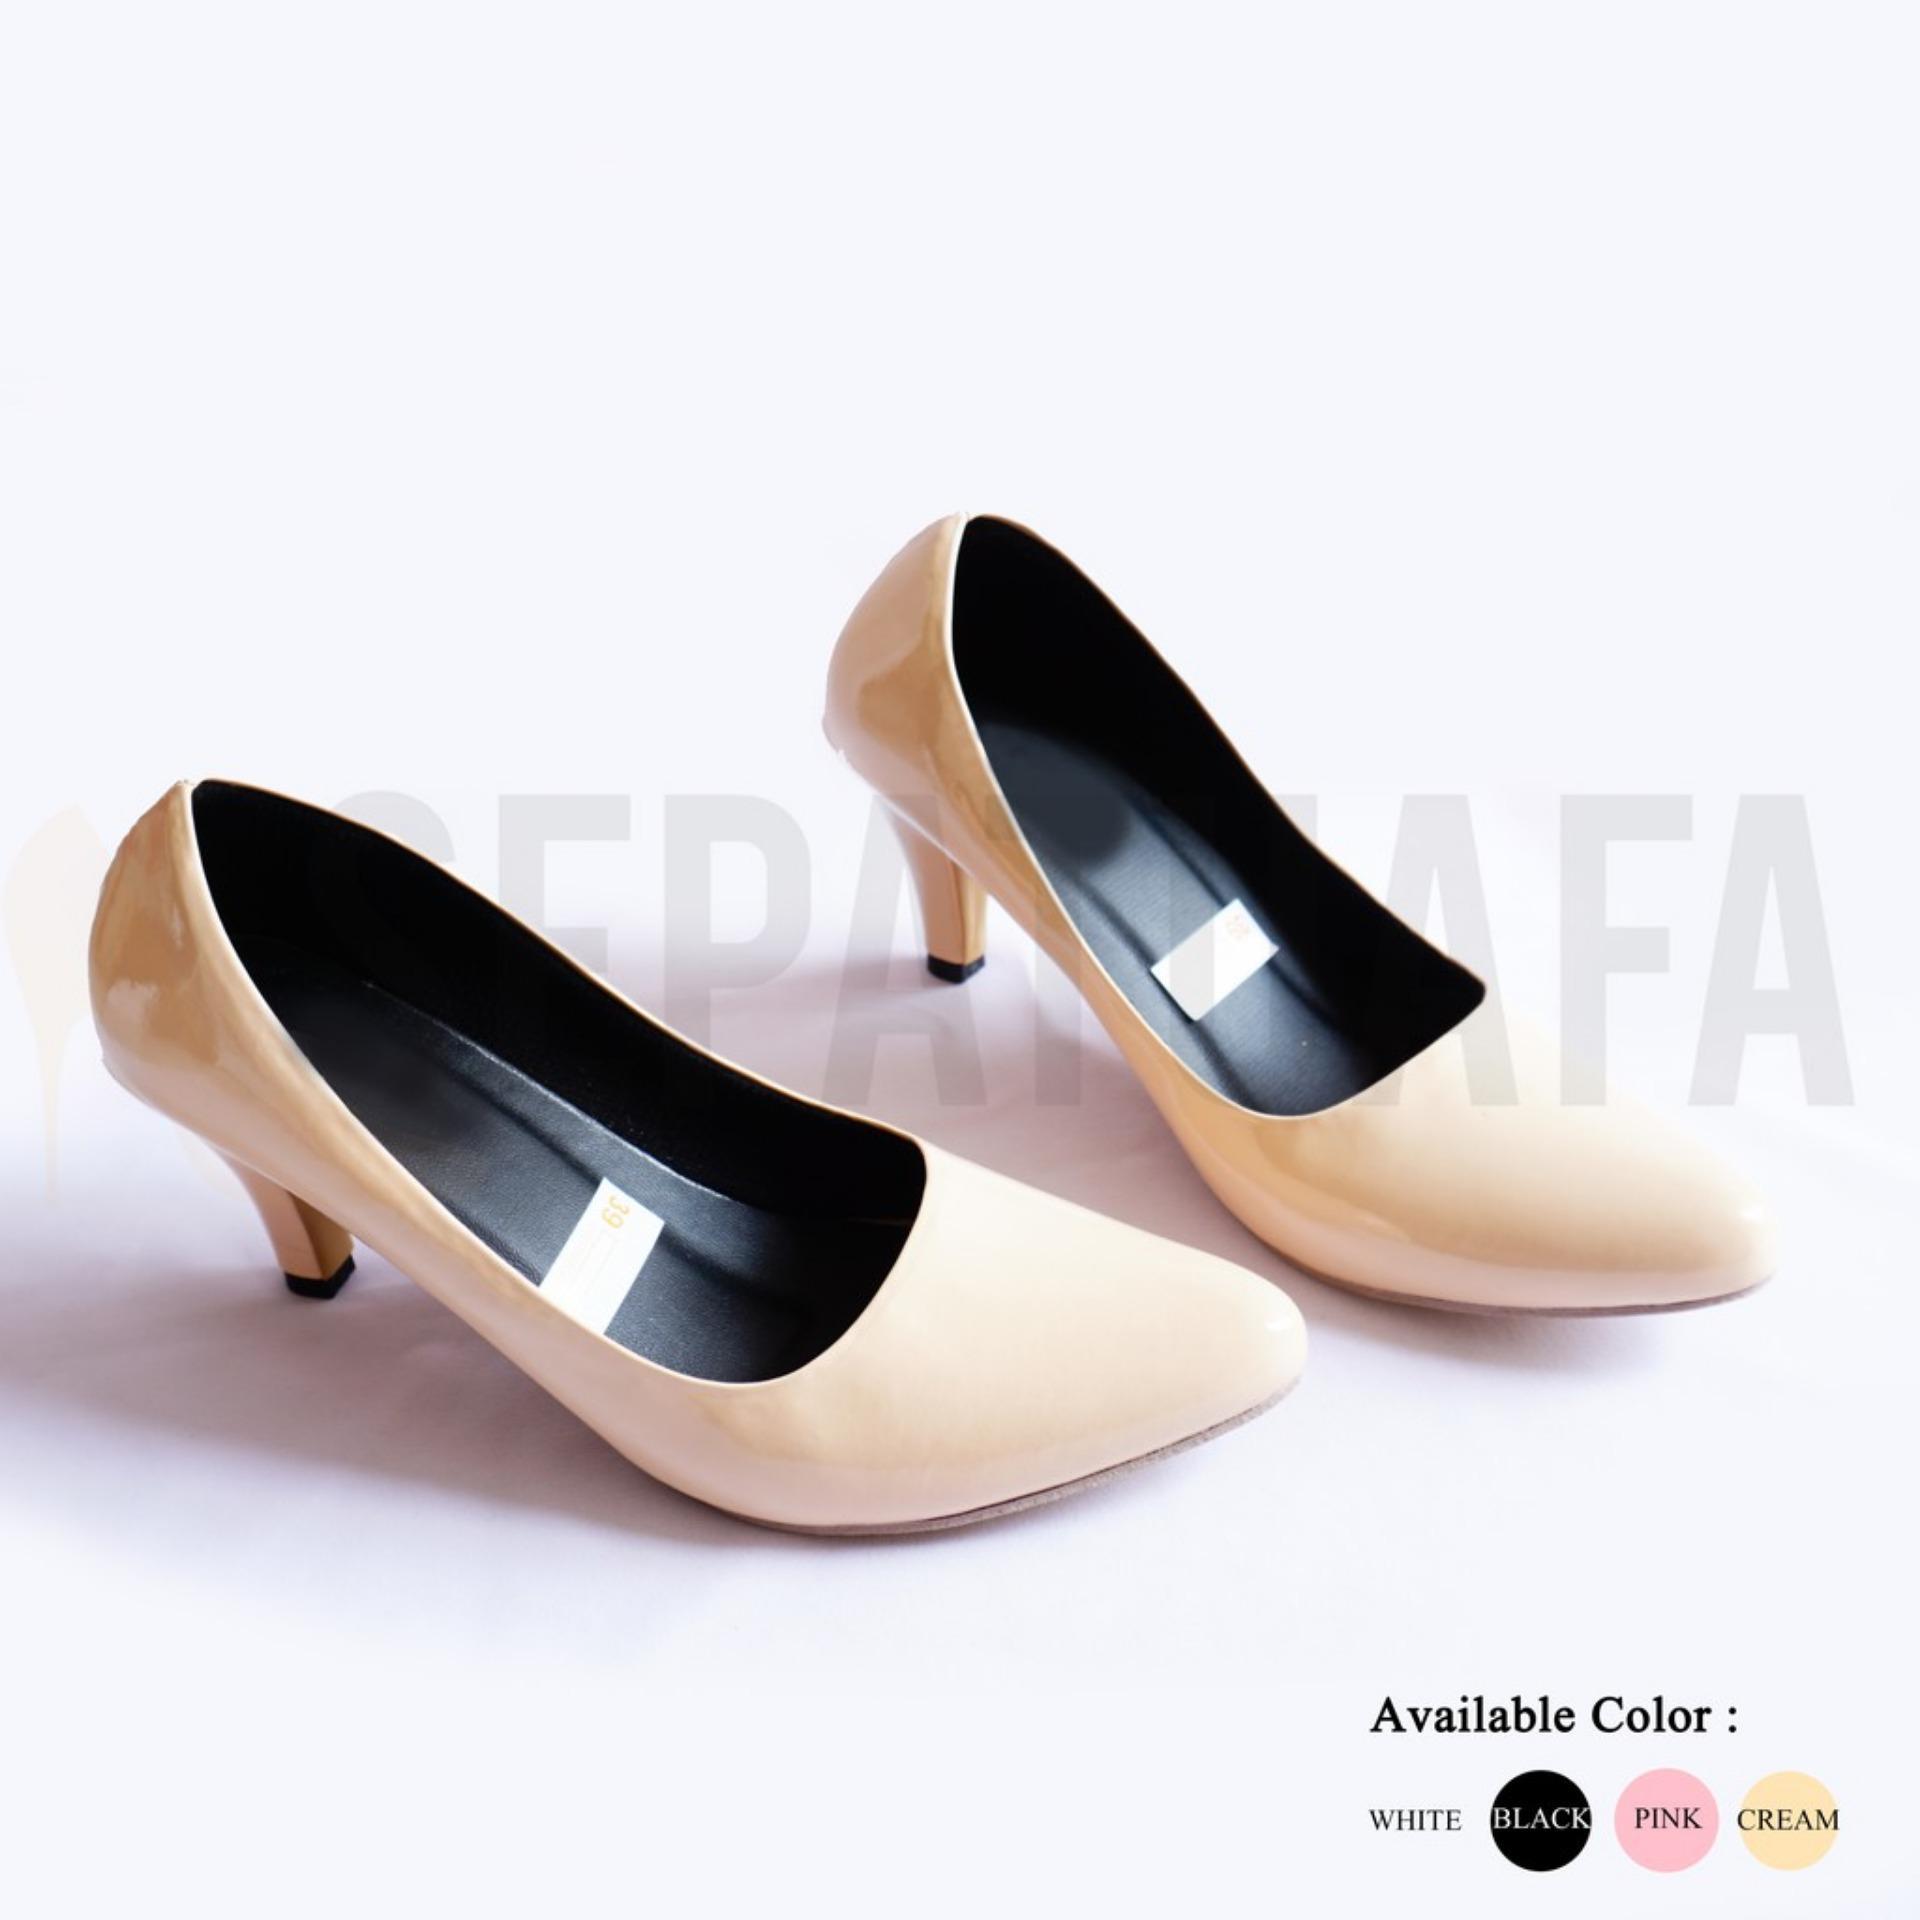 Sepatu Harga Terupdate 2 Jam Lalu Pk007 Bantalan Shoes Pad Silikon Transparan 6 Pcs Hug My Heels Shoegood High Pesta Glossy Pantopel Og09